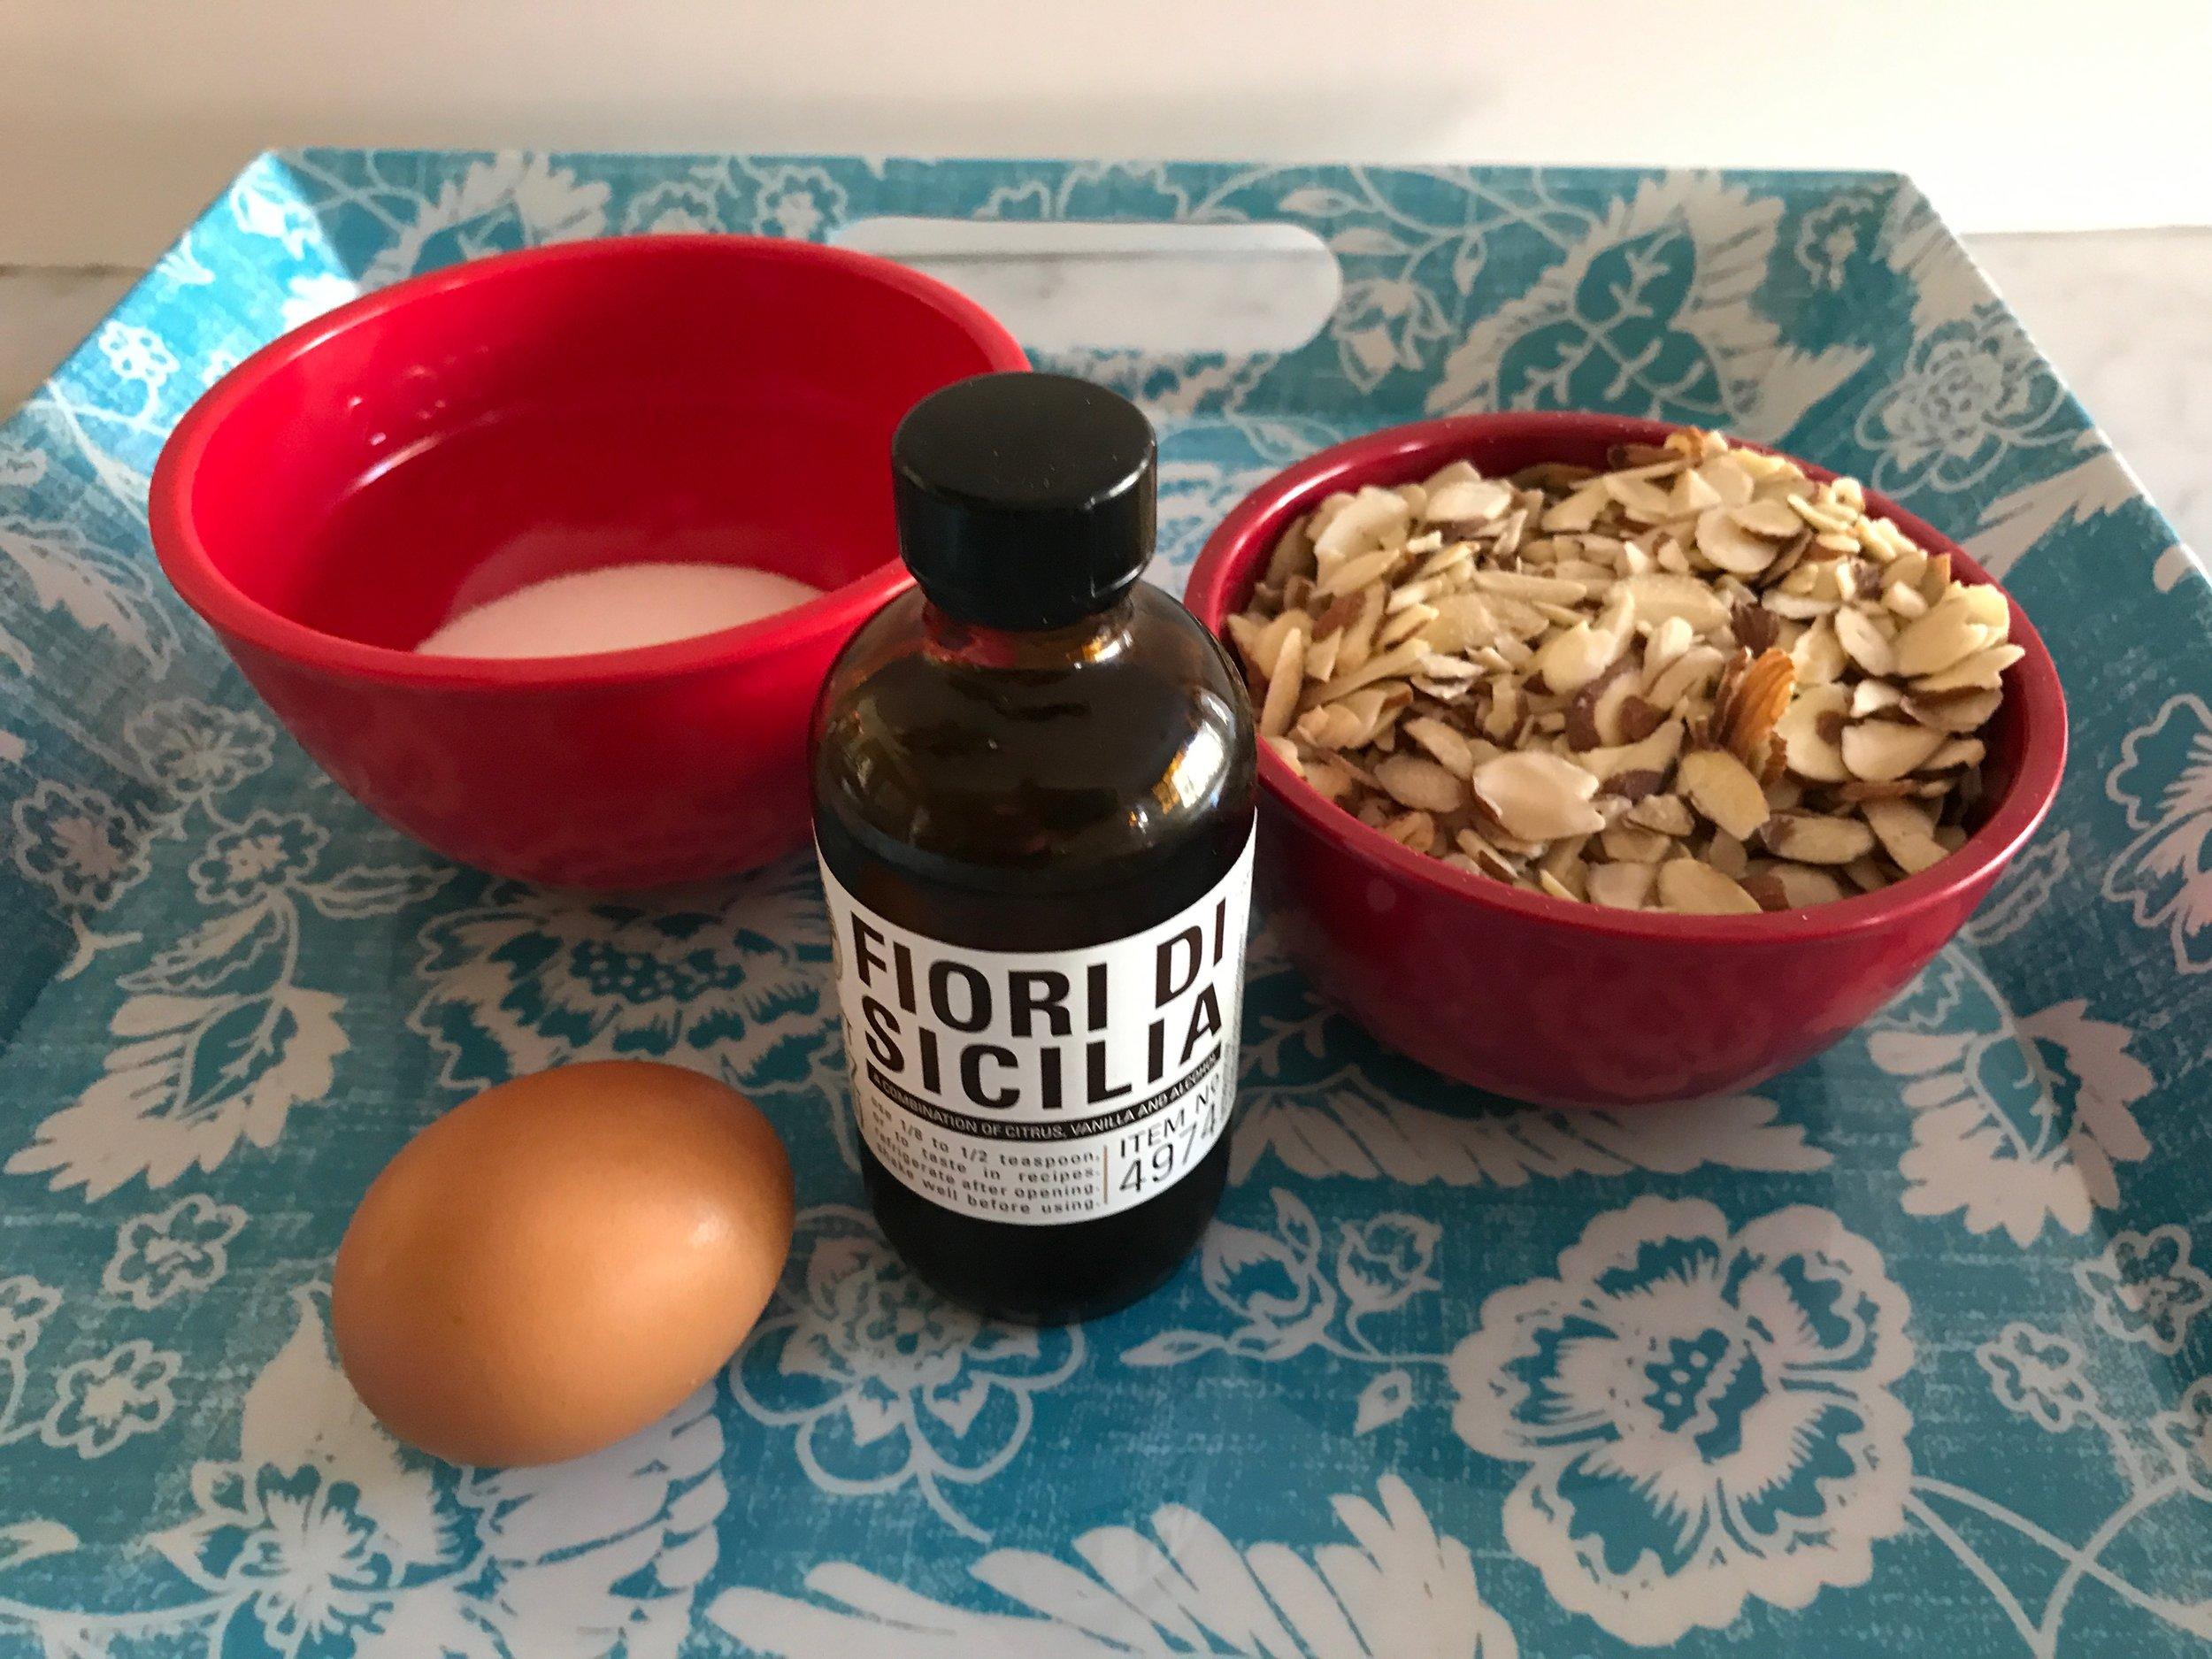 Ingredients - 6T-granulated sugar1 egg1¼ cup sliced almonds½ tsp. fiori di Sicilia